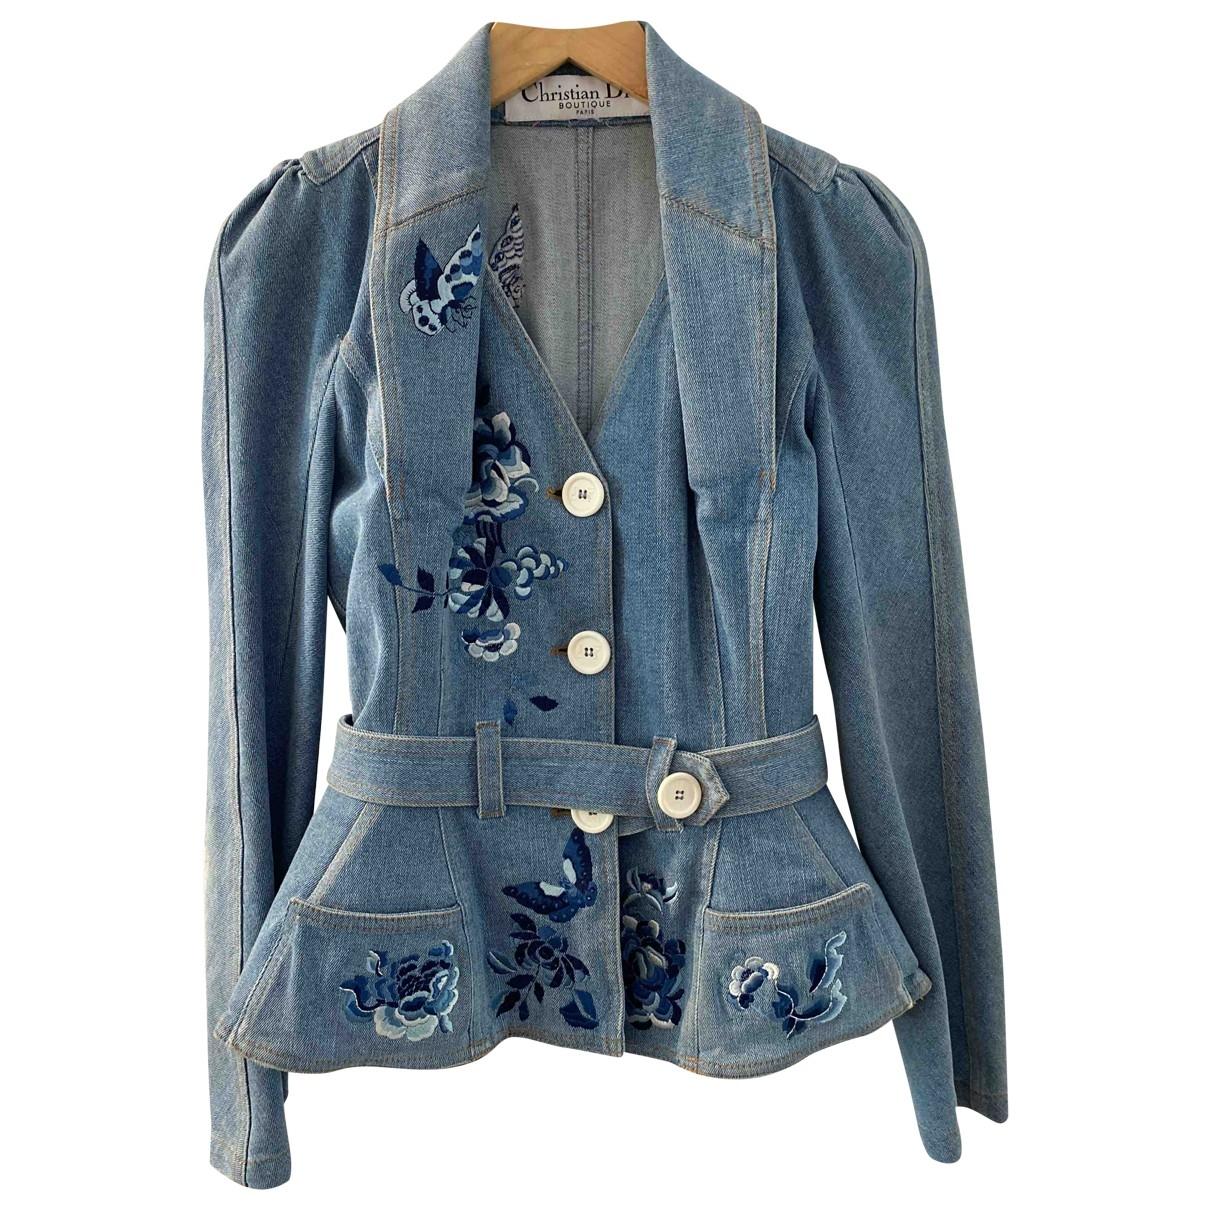 Christian Dior - Veste   pour femme en denim - bleu